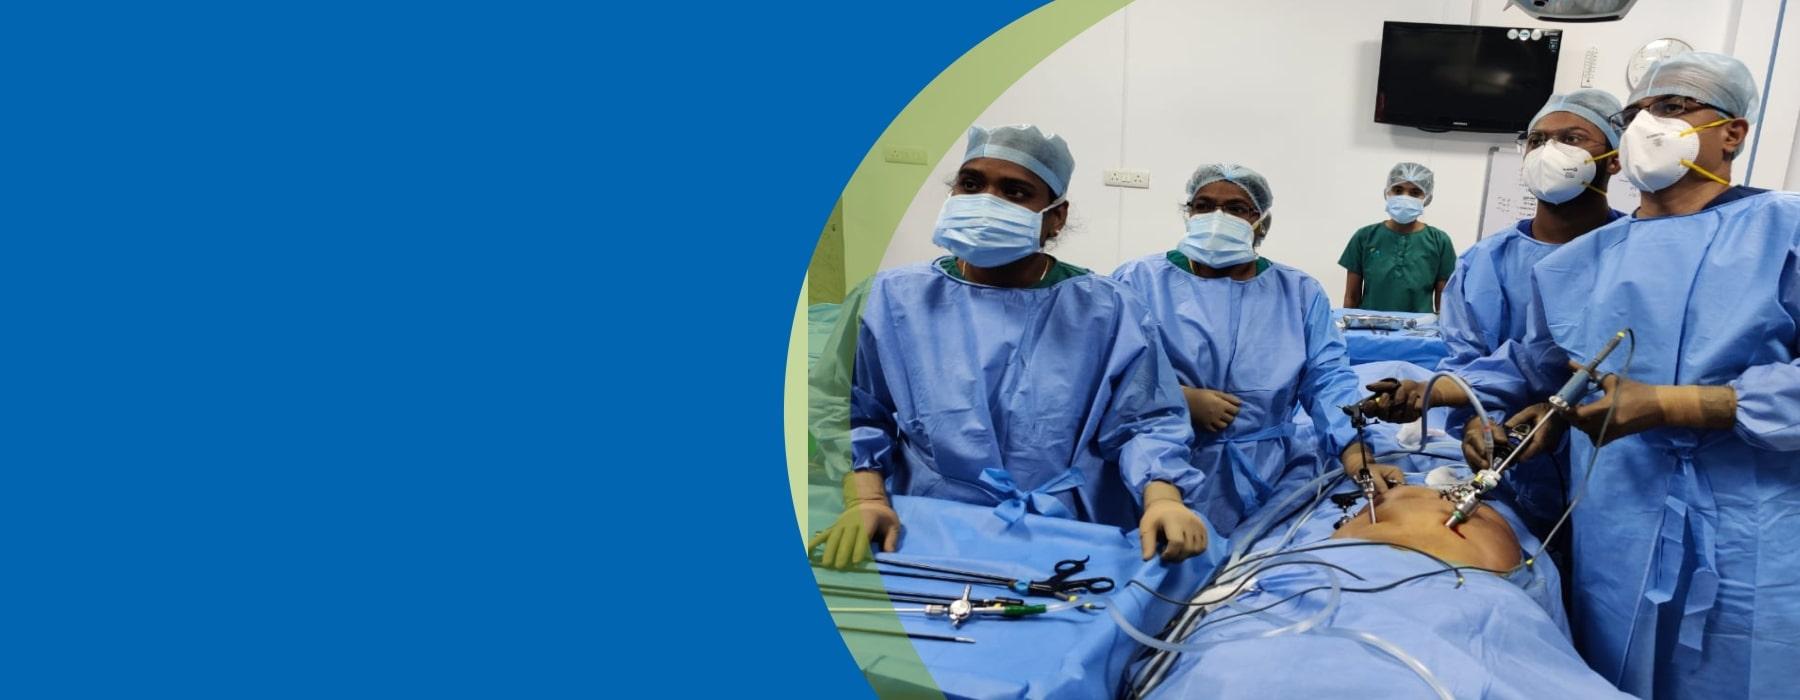 Best Laparoscopic Surgeon in Hyderabad